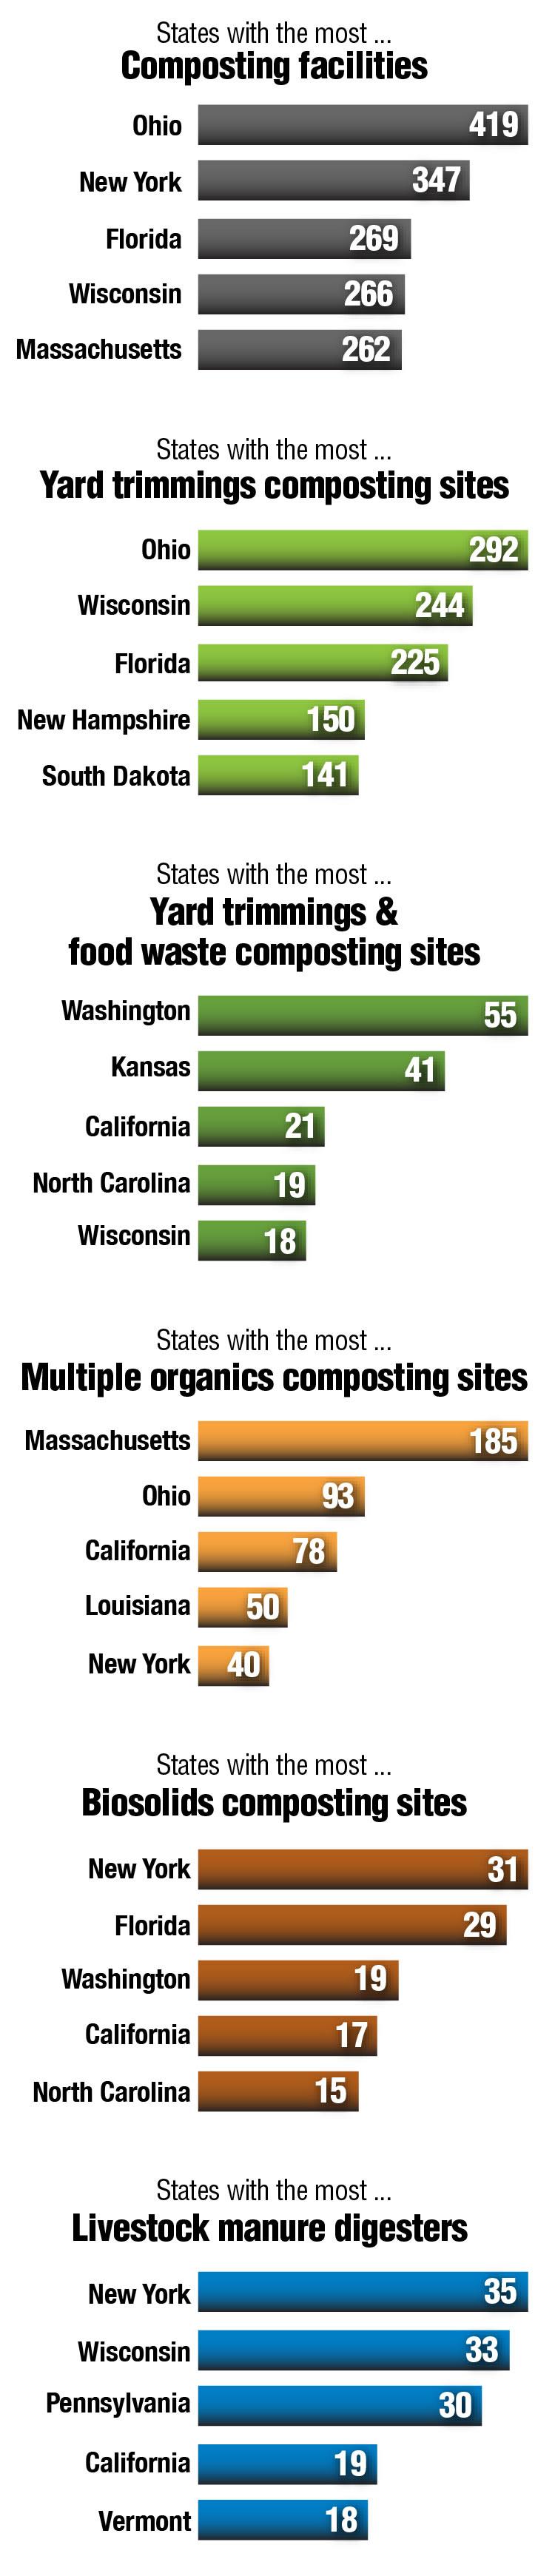 Credit: BioCycle.net  [1]  https://www.usda.gov/oce/foodwaste/faqs.htm   [2]  http://www.feedingamerica.org/hunger-in-america   [i] http://www.foodwastealliance.org/services/